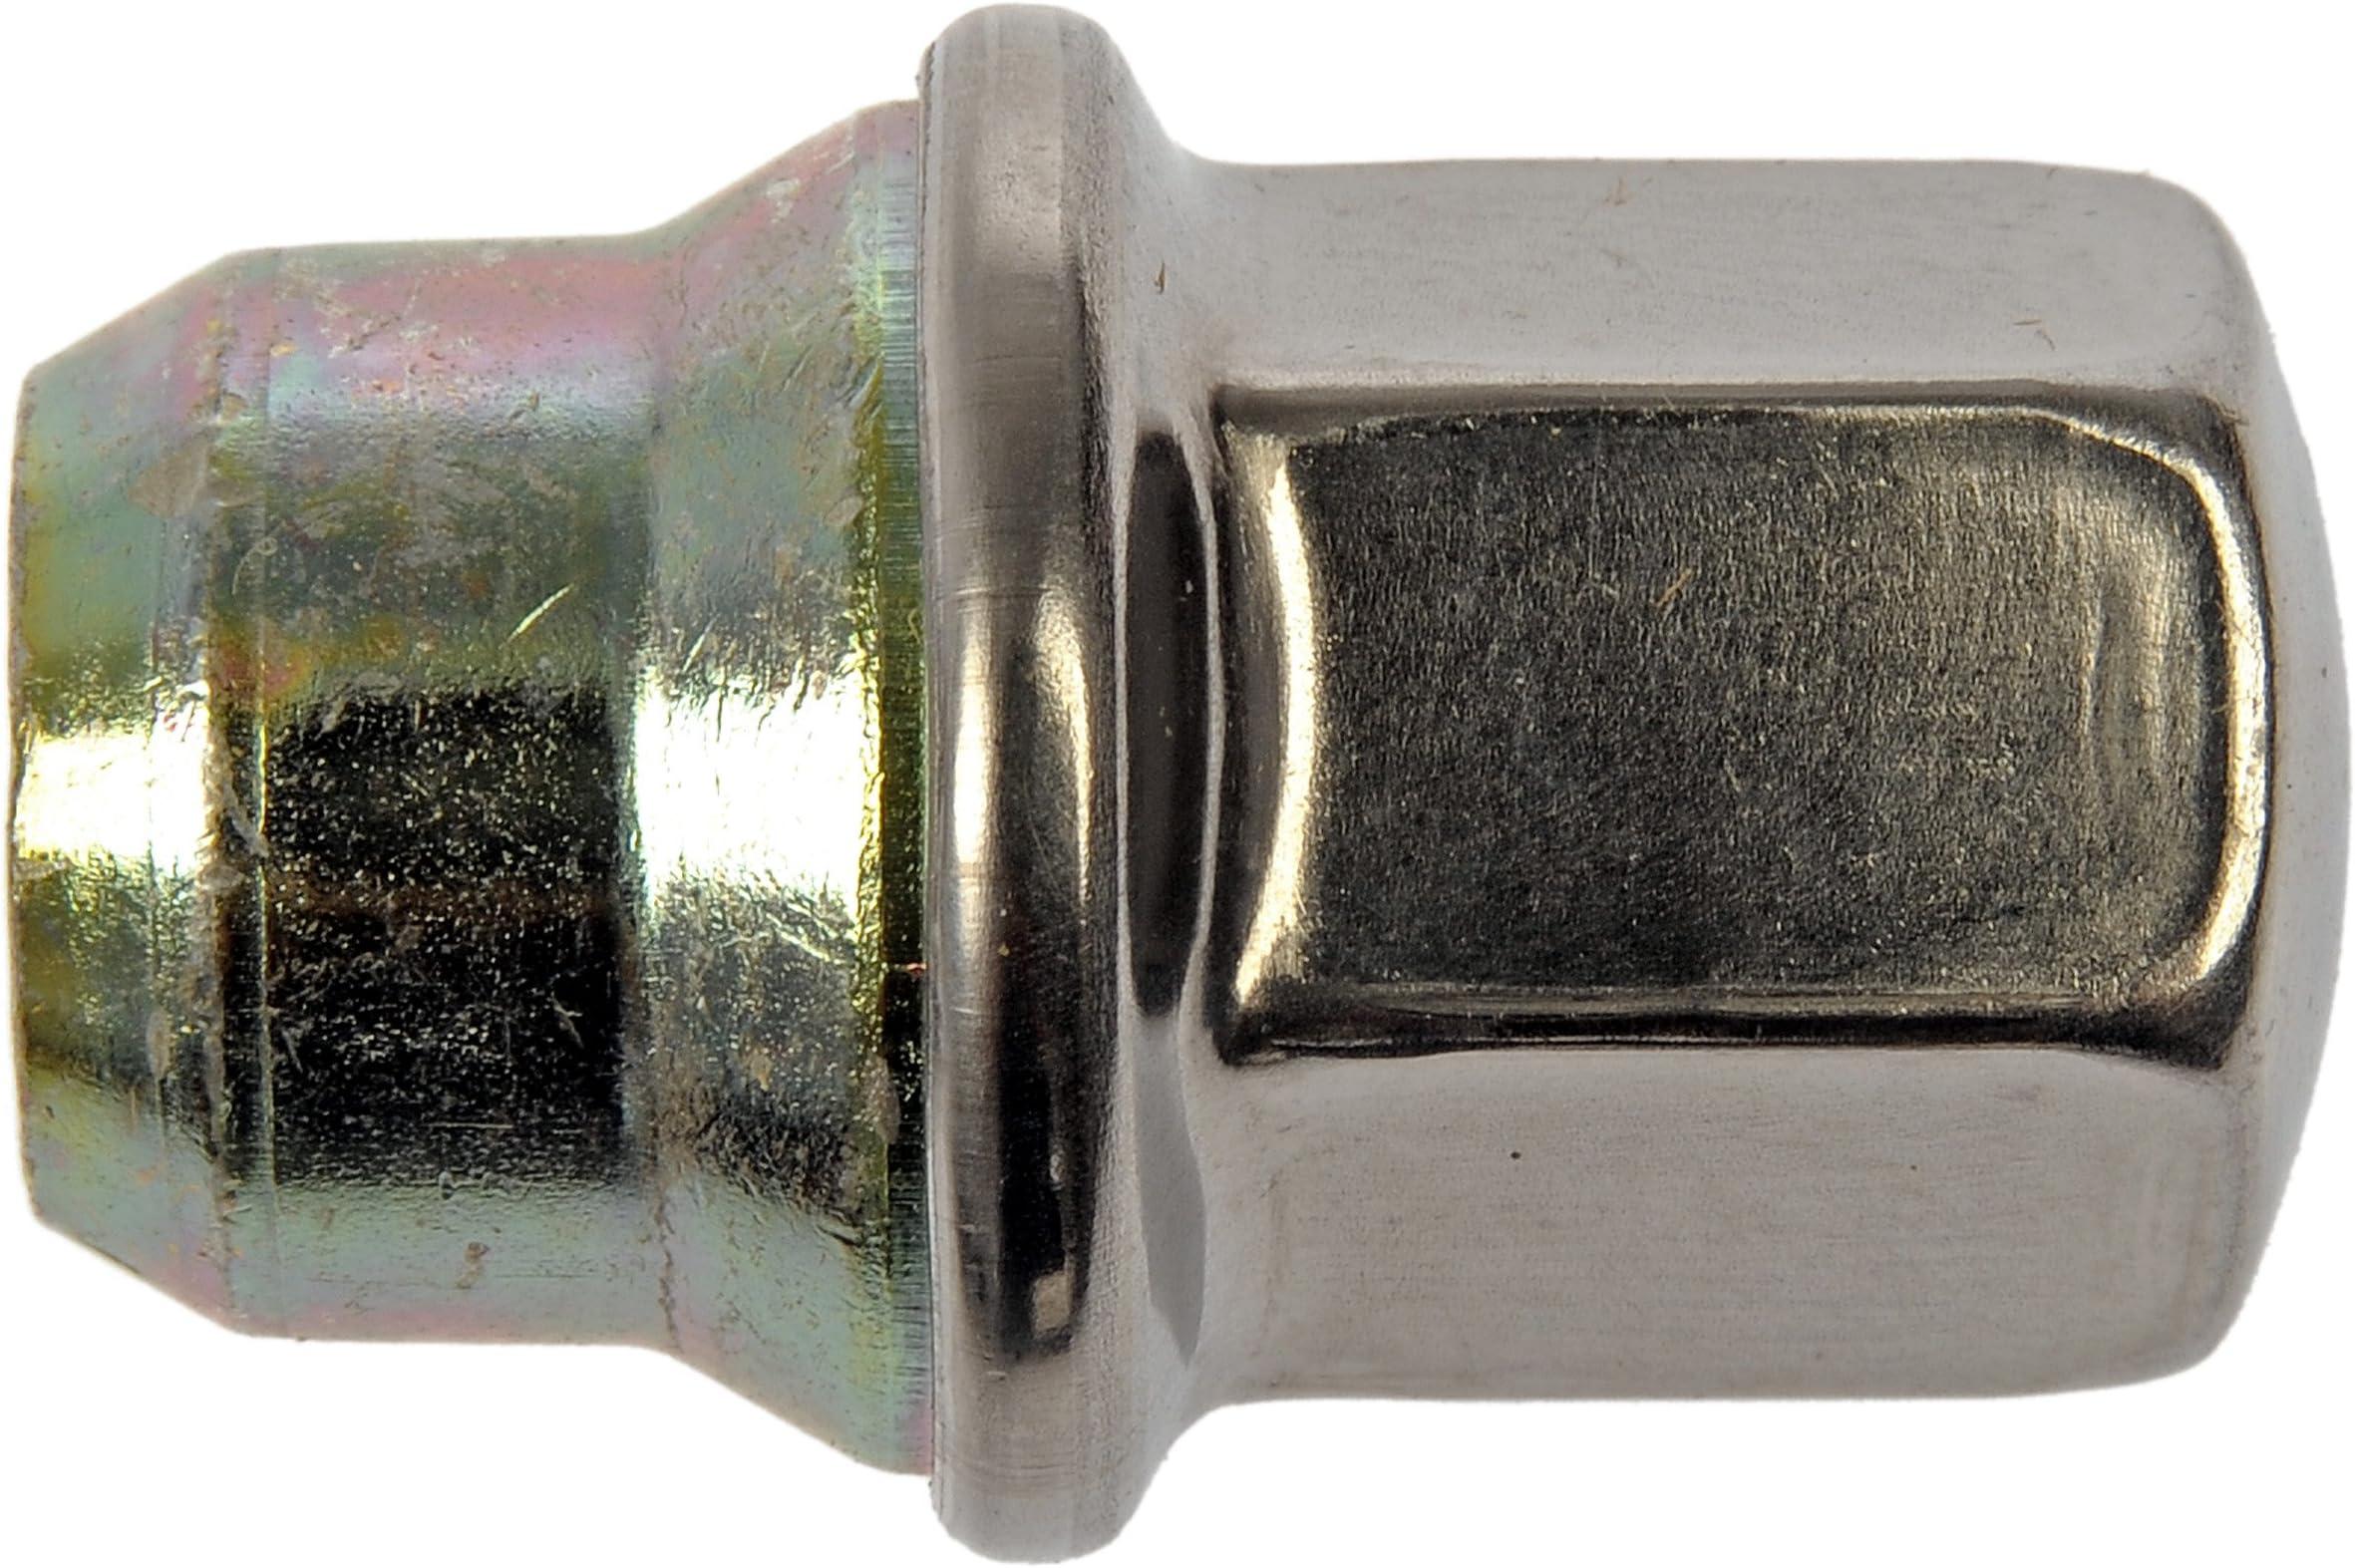 Dorman 611-269 Wheel Lug Nut for Select Dodge Models, Pack of 10 (OE FIX)